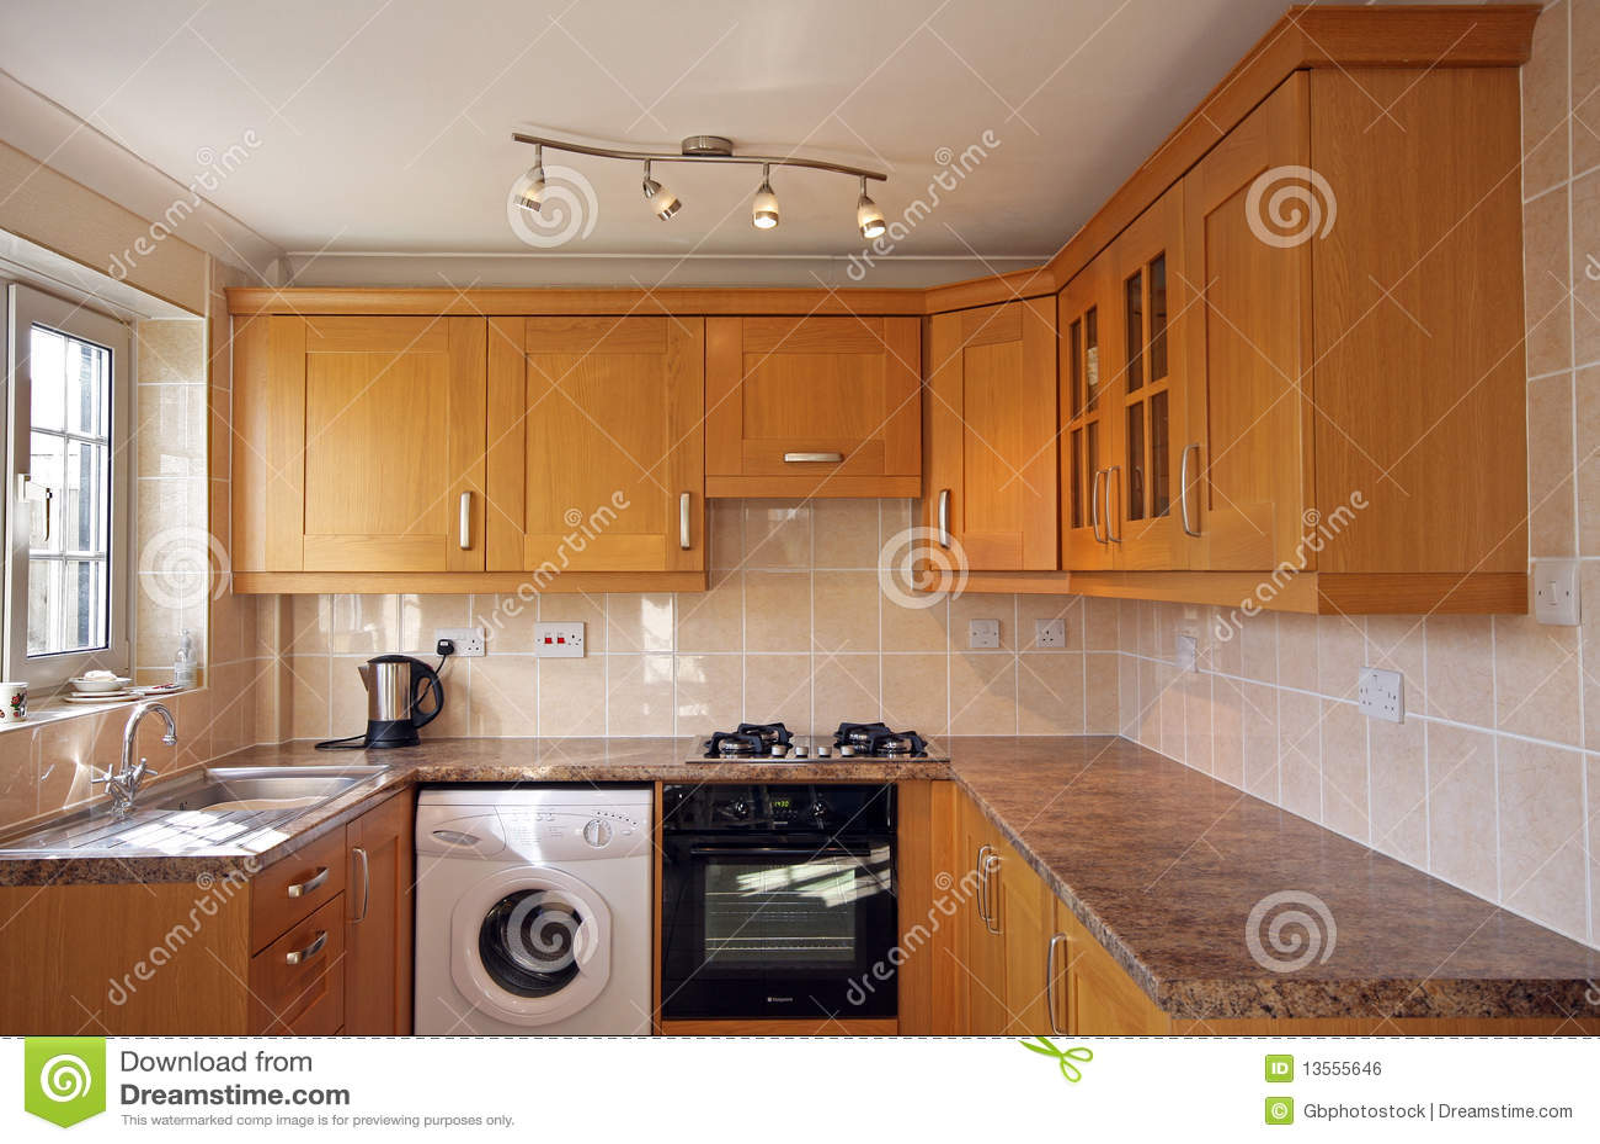 Fein Küchen Maßeinheiten Ideen - Küche Set Ideen - deriherusweets.info